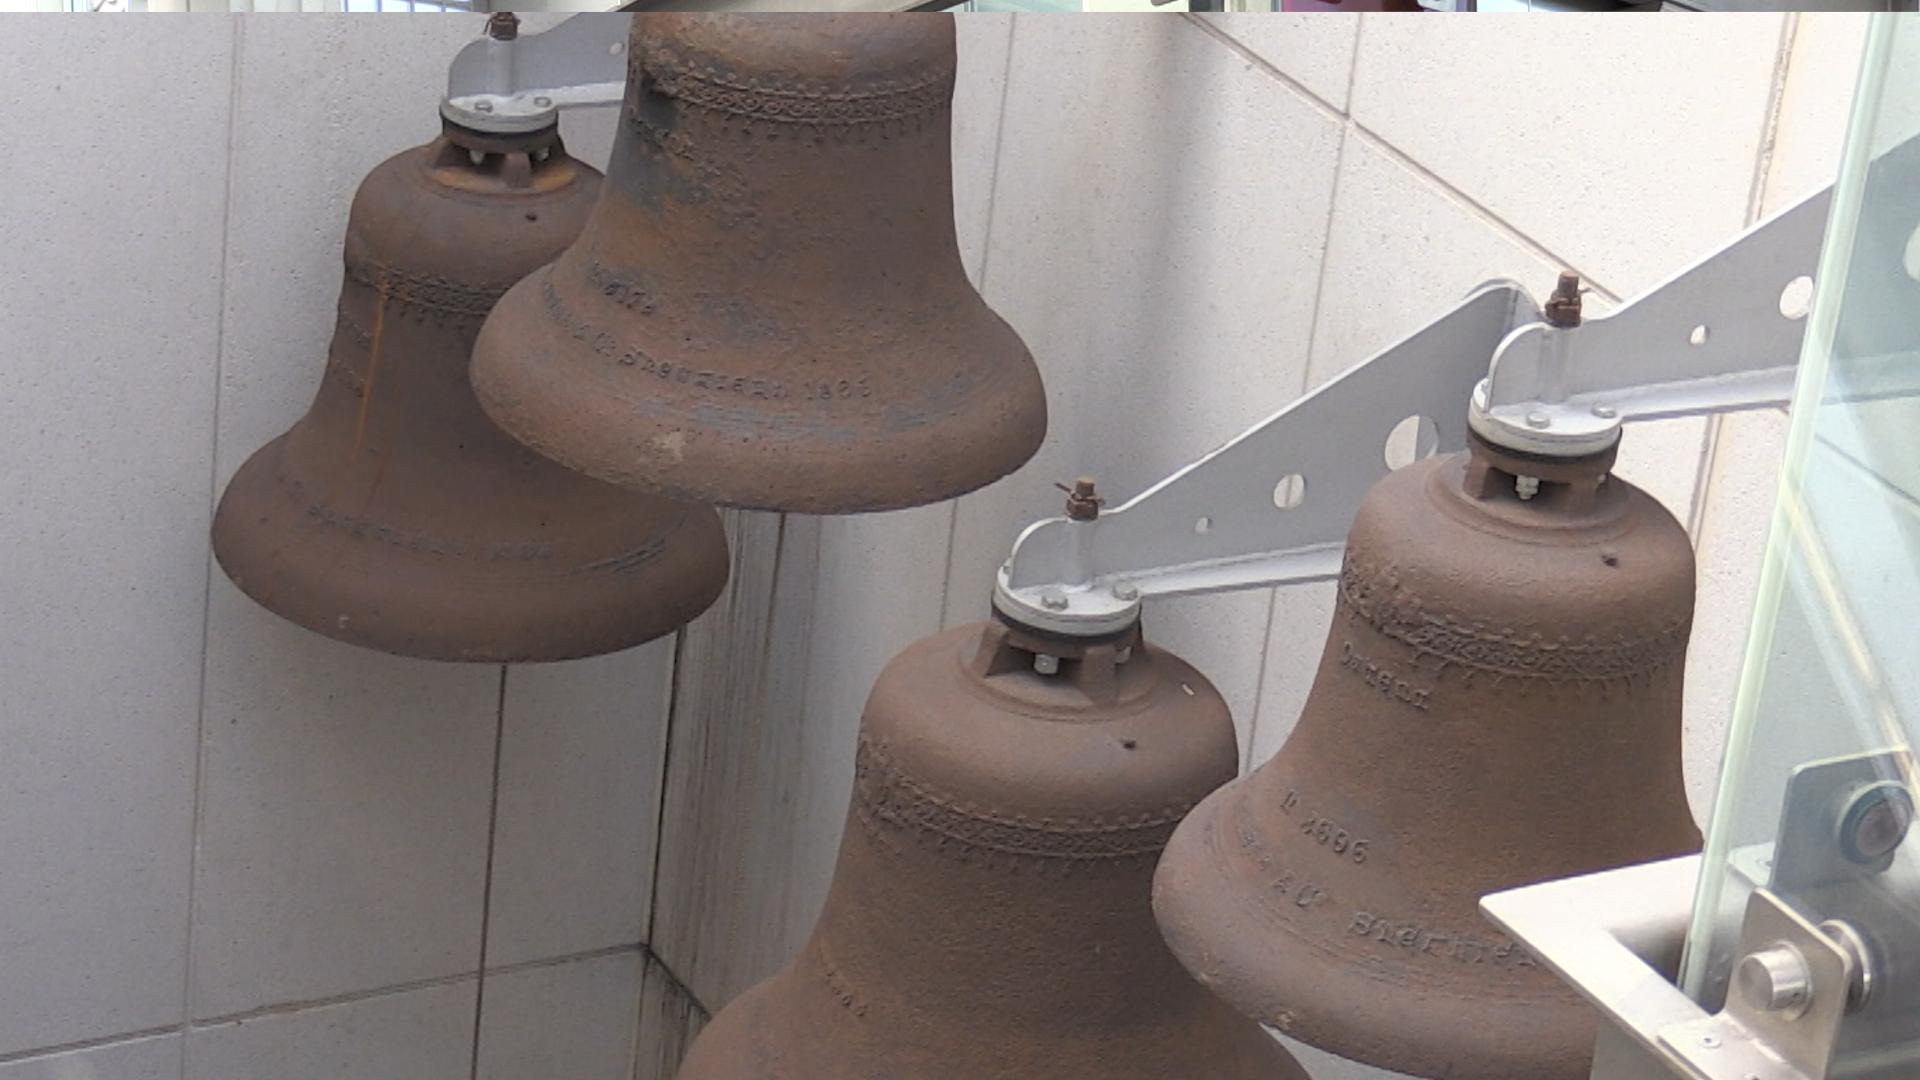 Heritage bells ring at Millennium Gallery